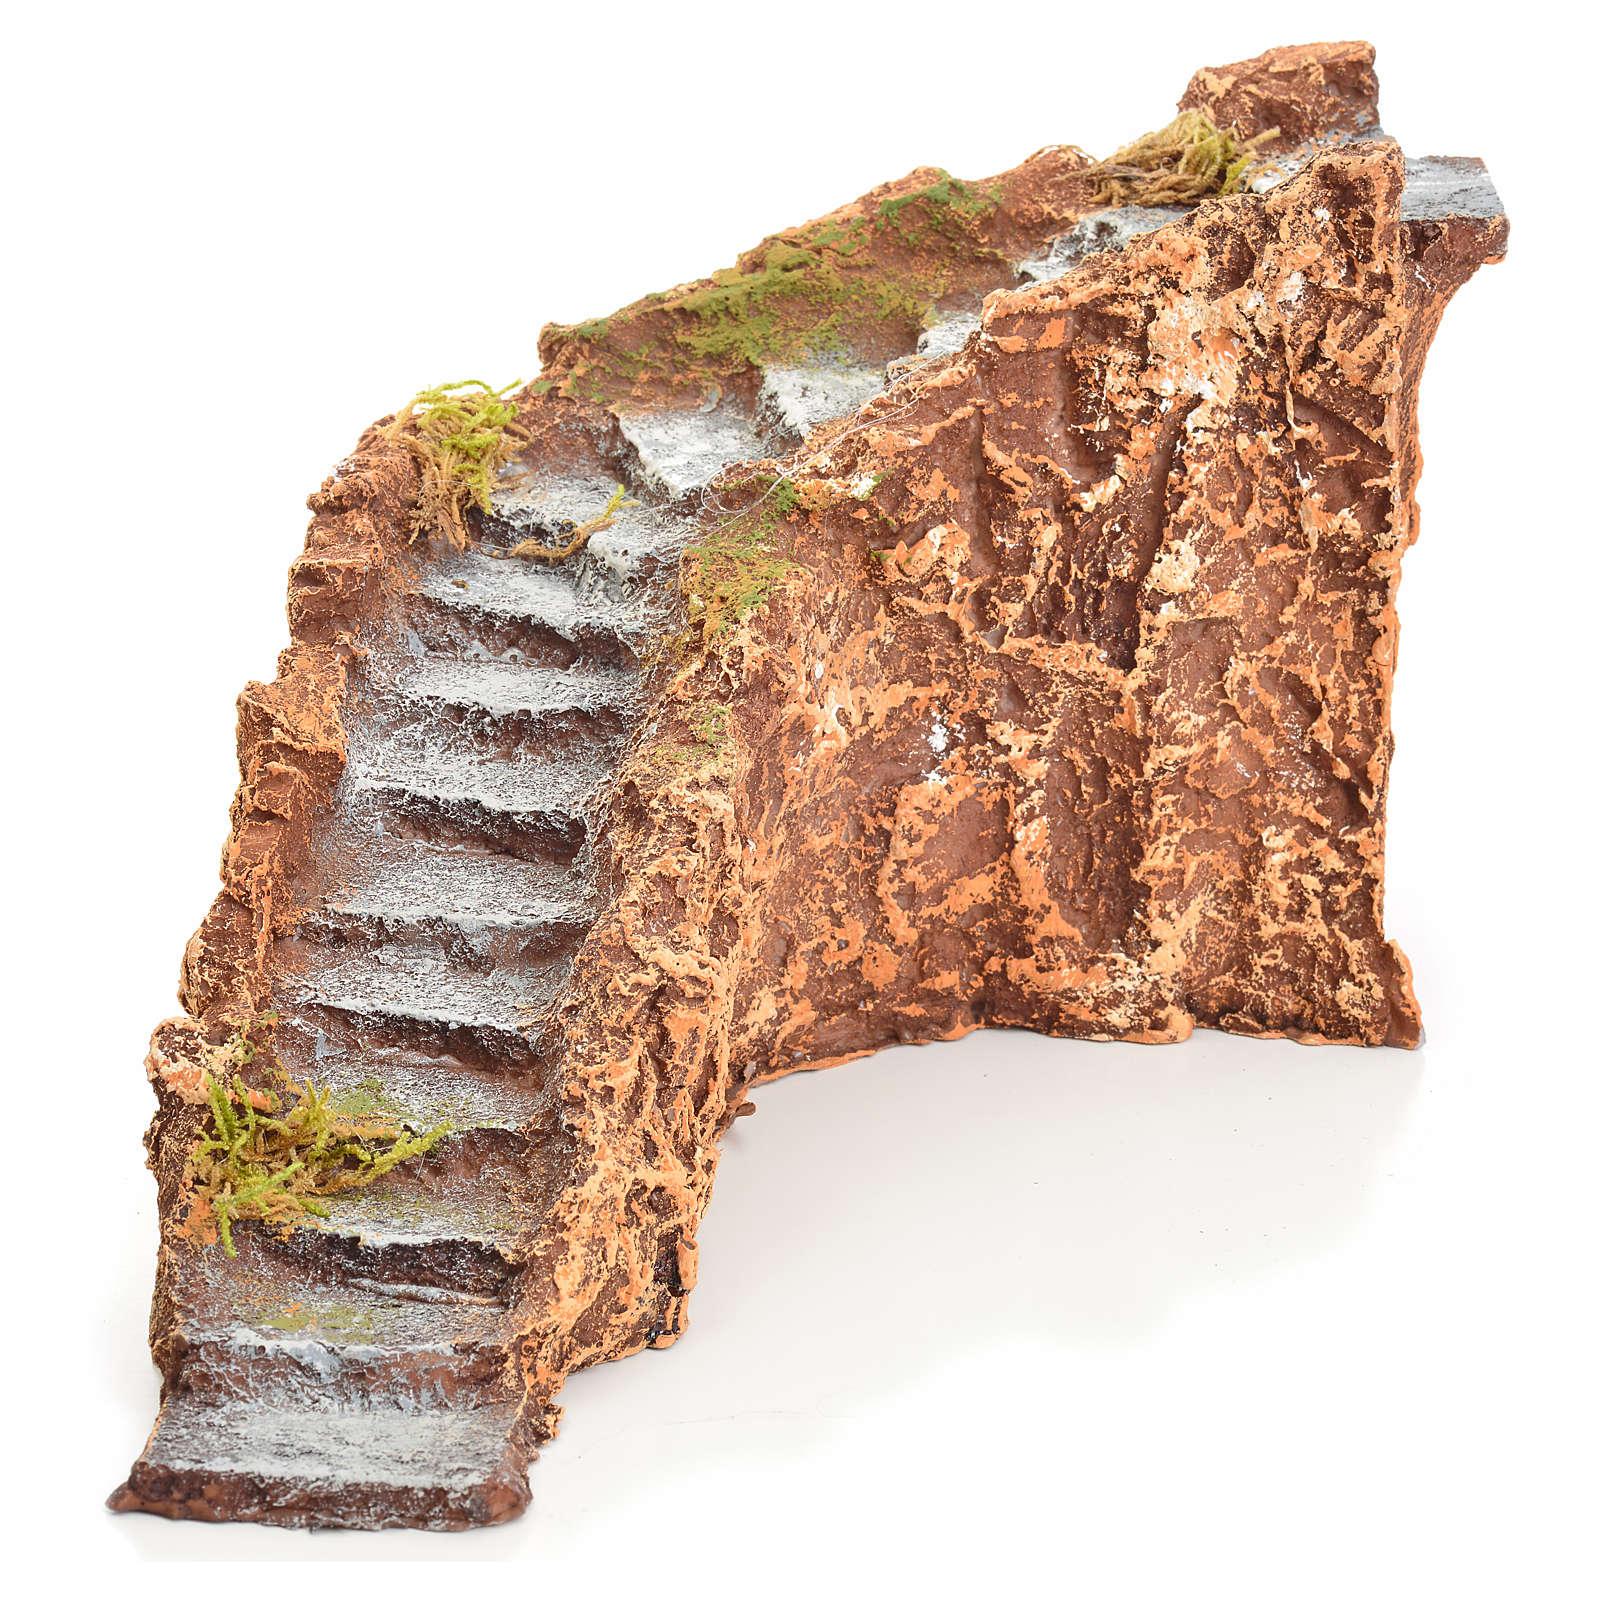 Scala resina per presepe 10x20x16 cm 4